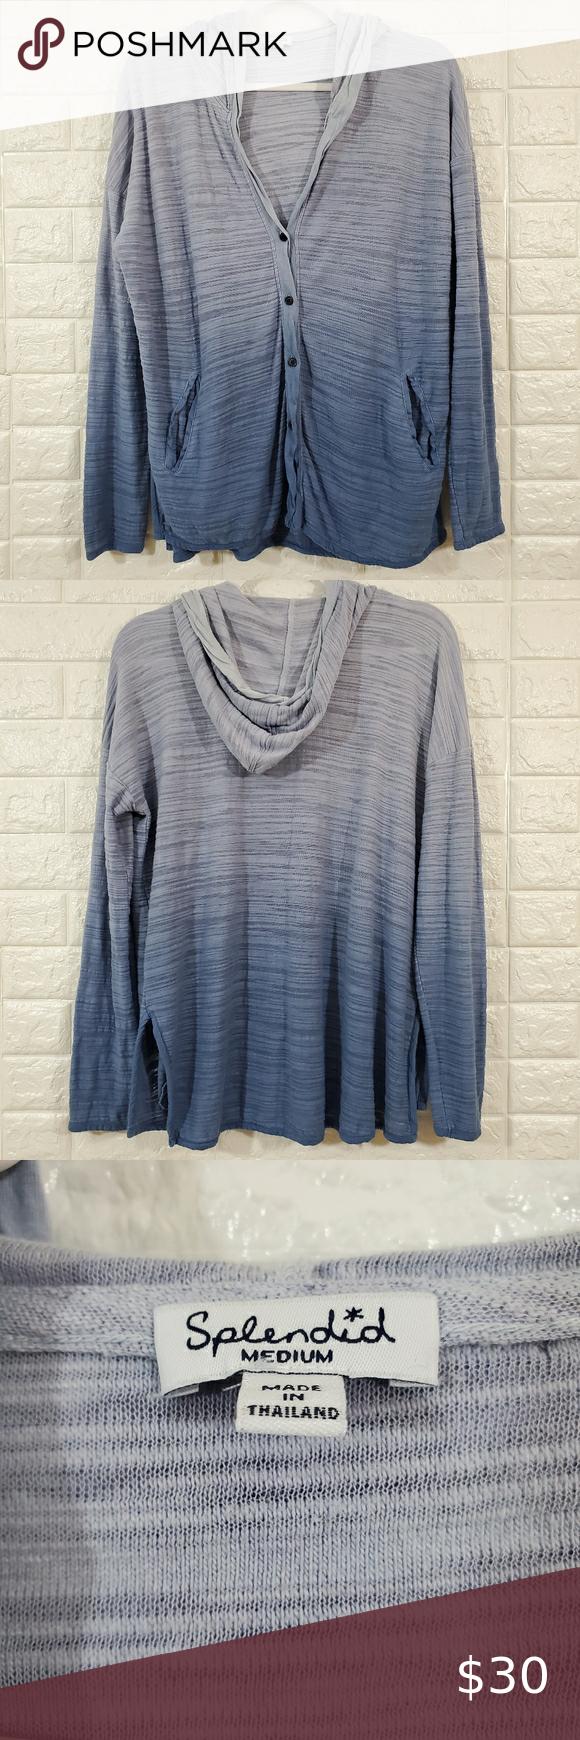 Splendid Dye Tie Hoodie Sweatshirt Size M Sweatshirts Hoodie Hoodies Sweatshirts [ 1740 x 580 Pixel ]